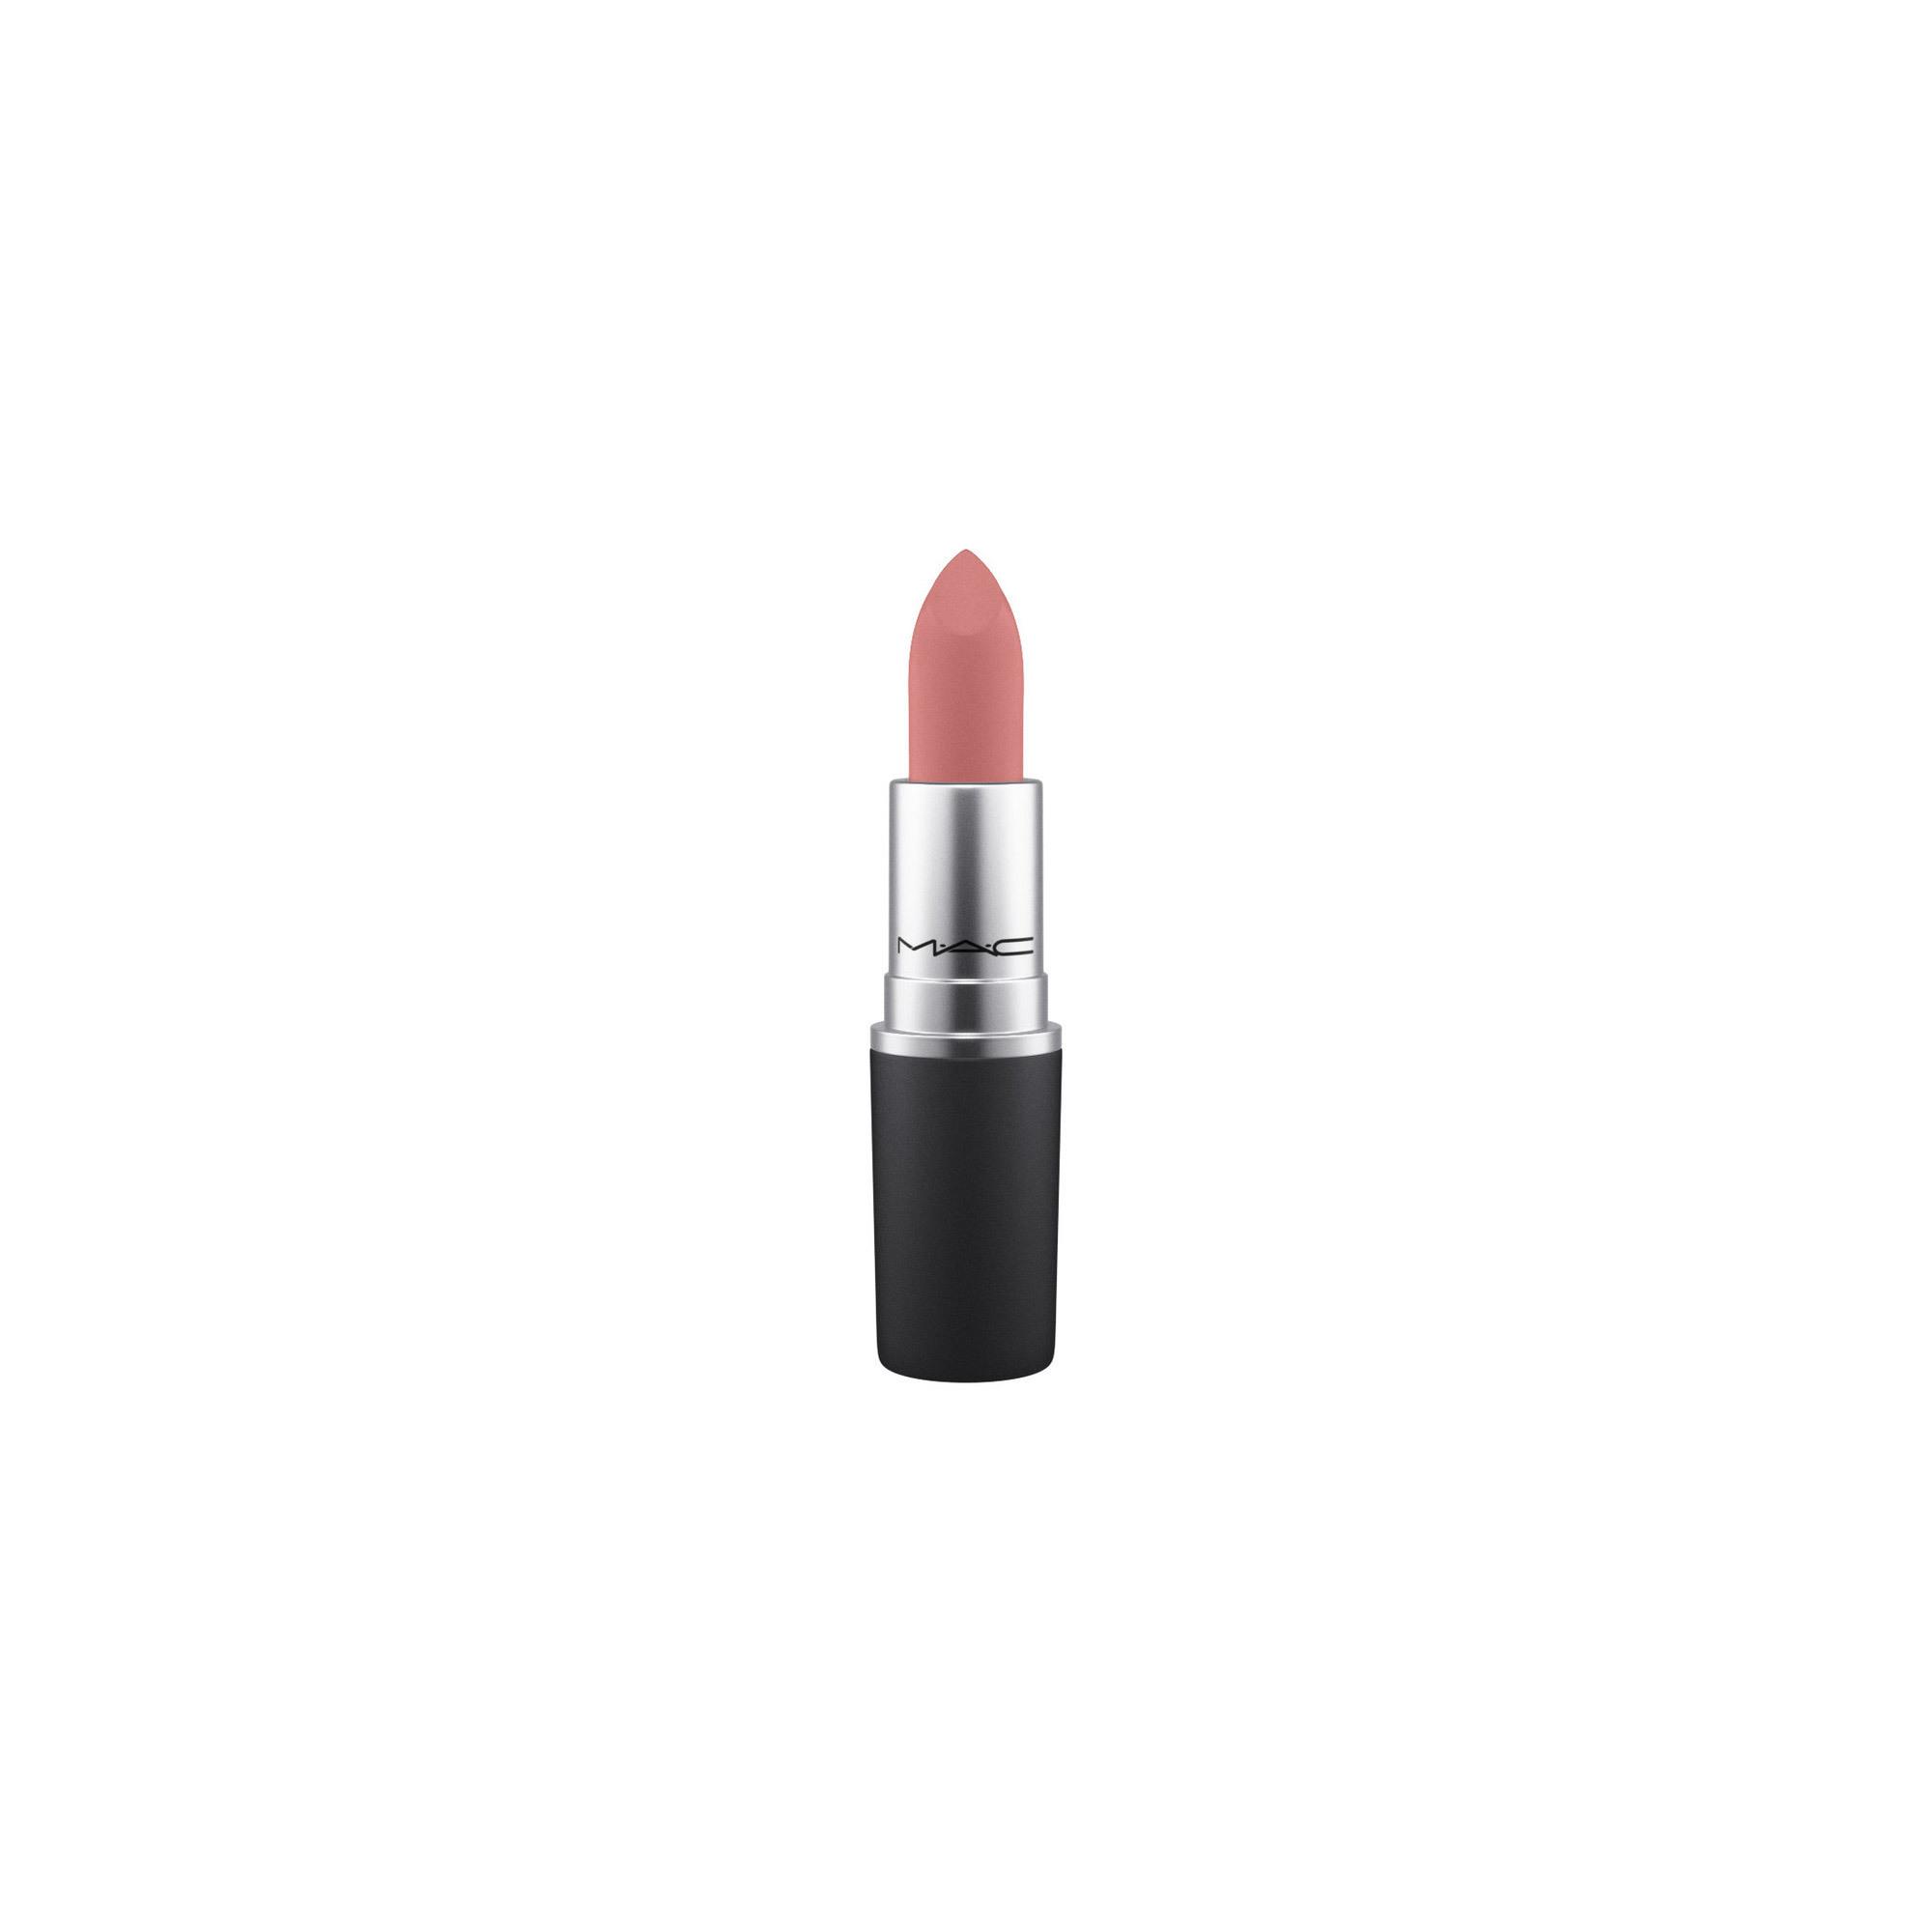 MAC Powder Kiss Lipstick, scattered petals